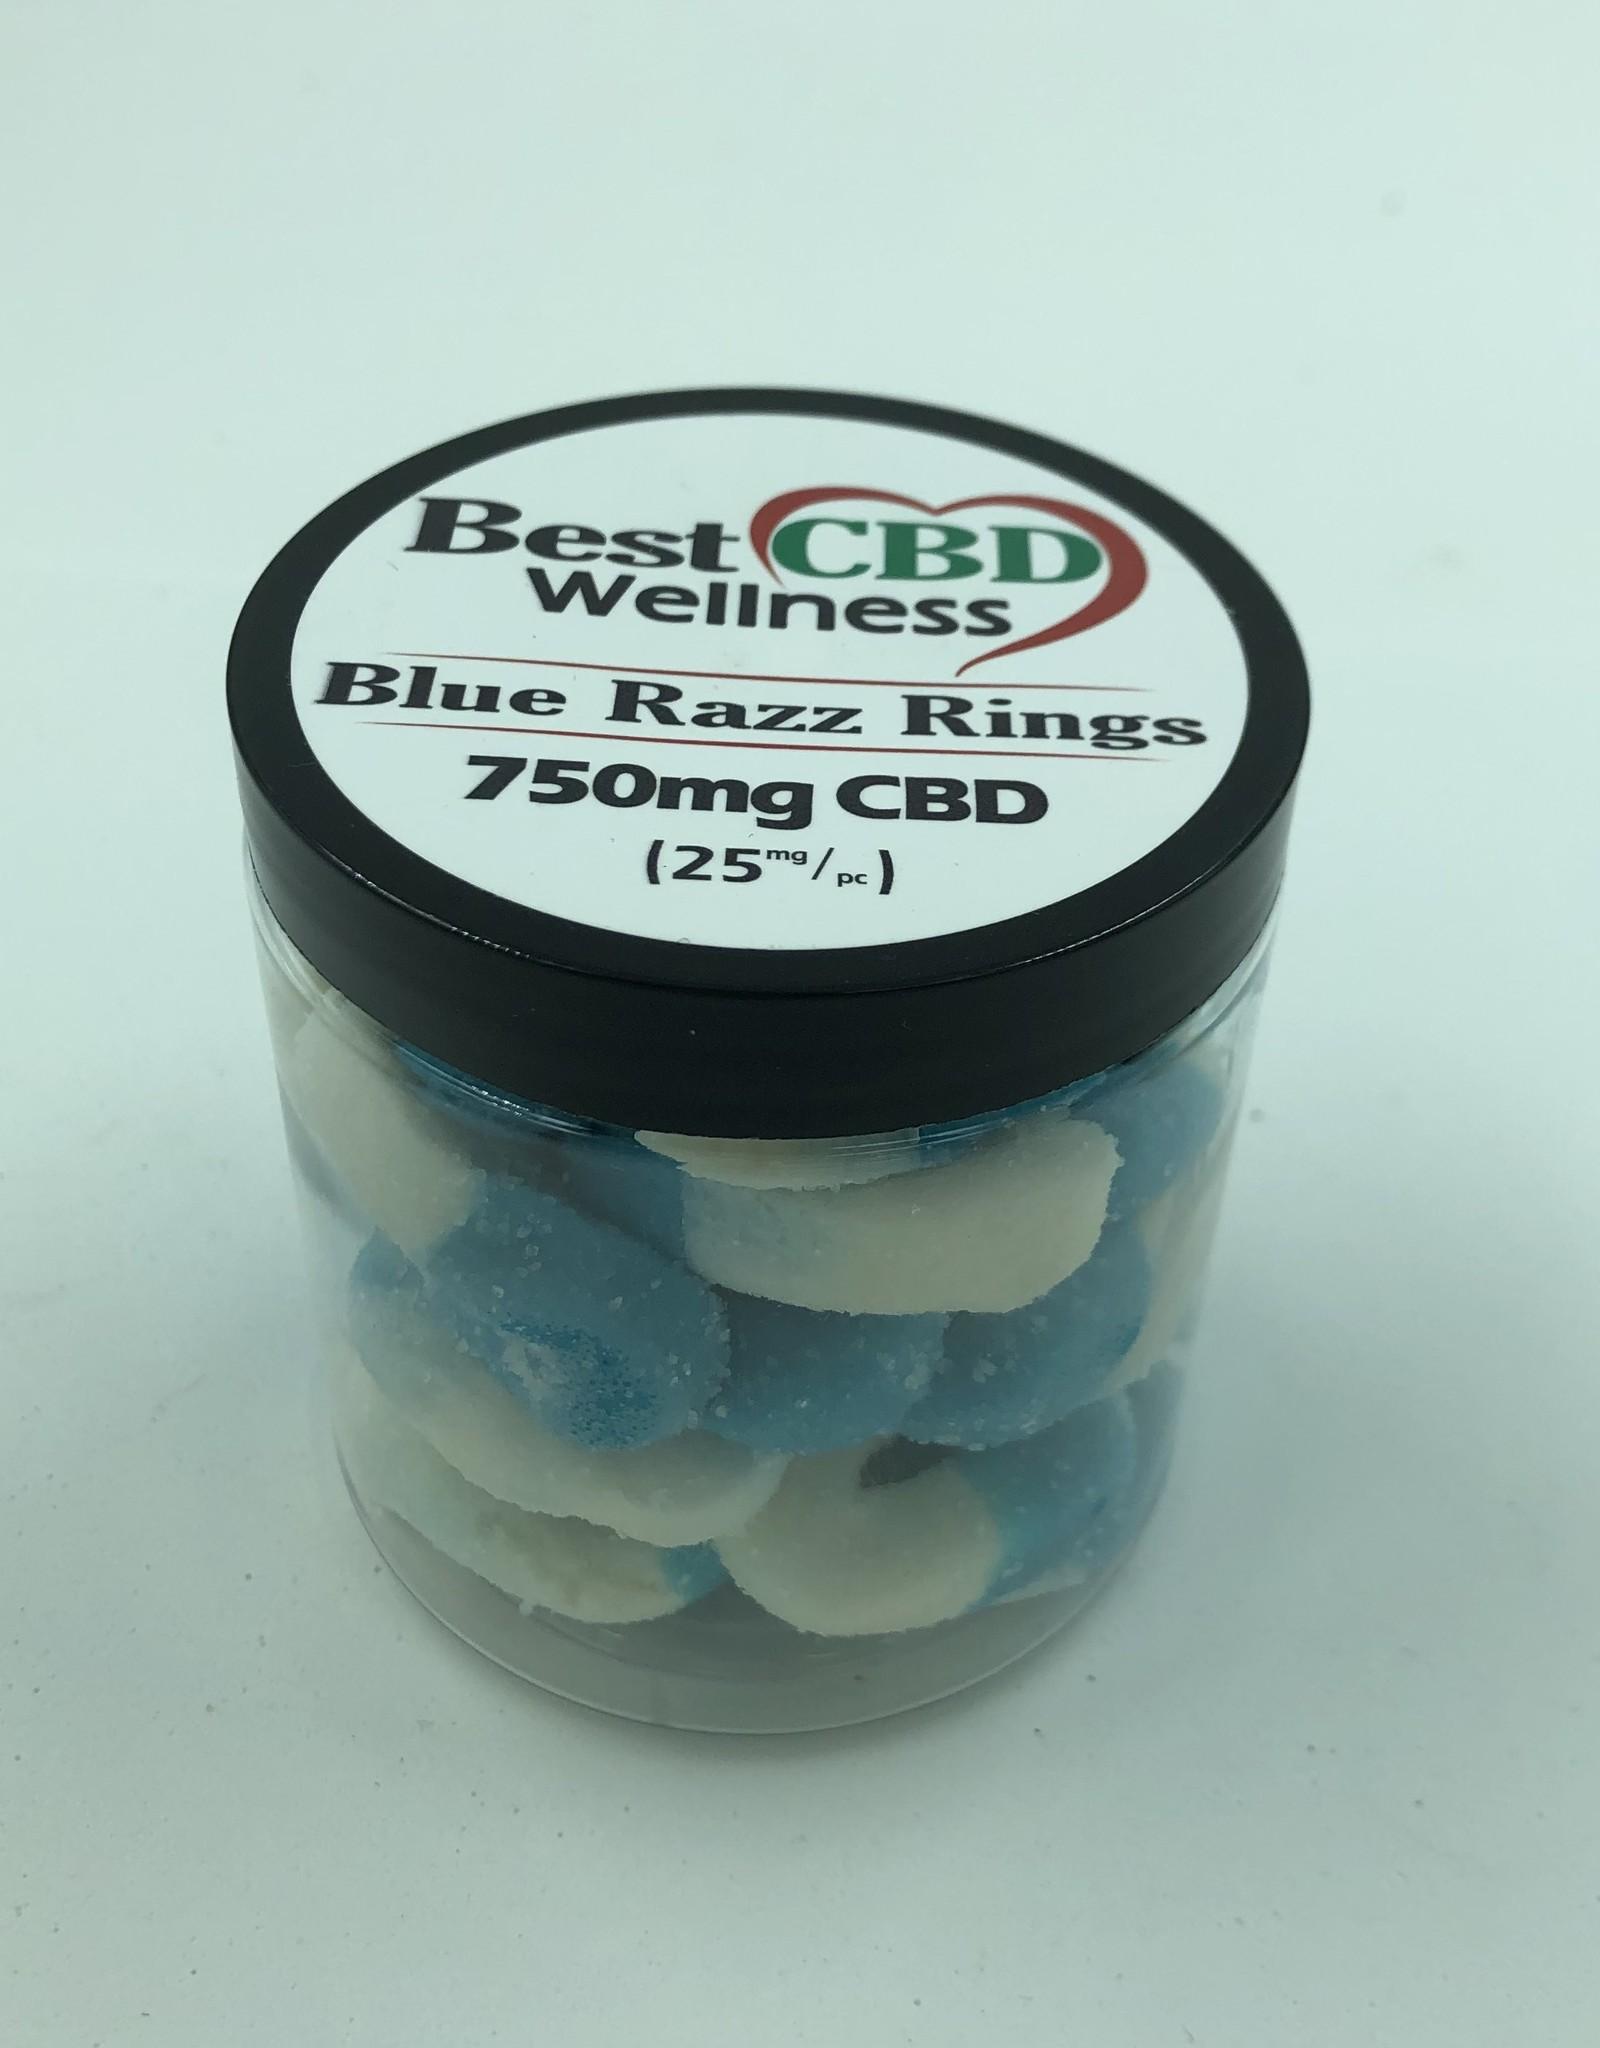 Best CBD Wellness Isolate CBD Blue Razz Rings 750mg 30 pc/25mg ea